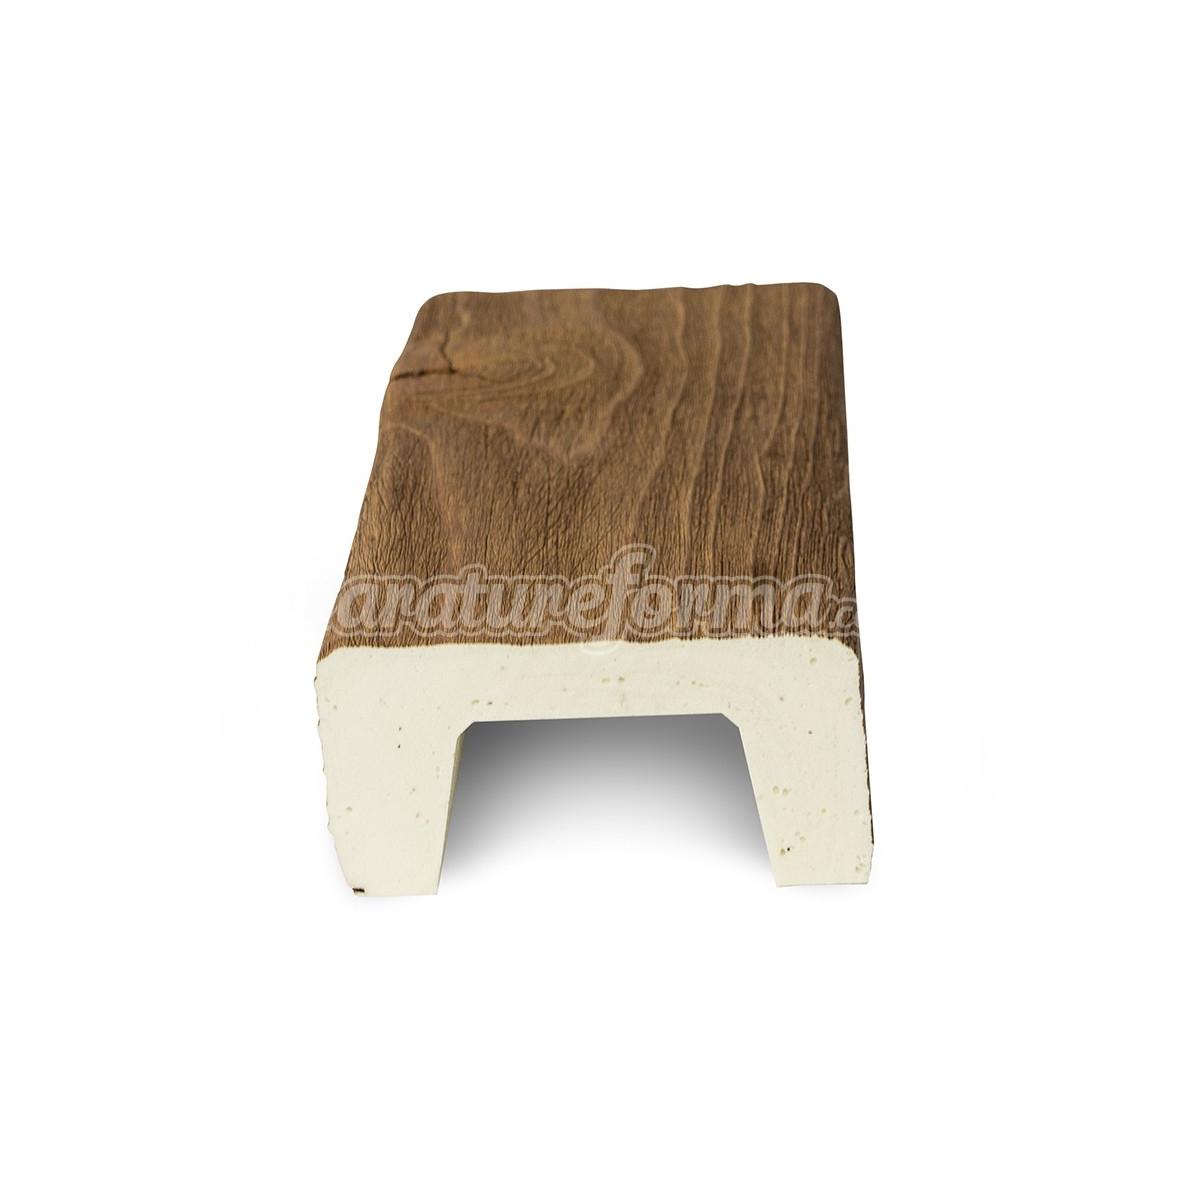 Viga imitación a madera de poliuretano Grupo Unamacor